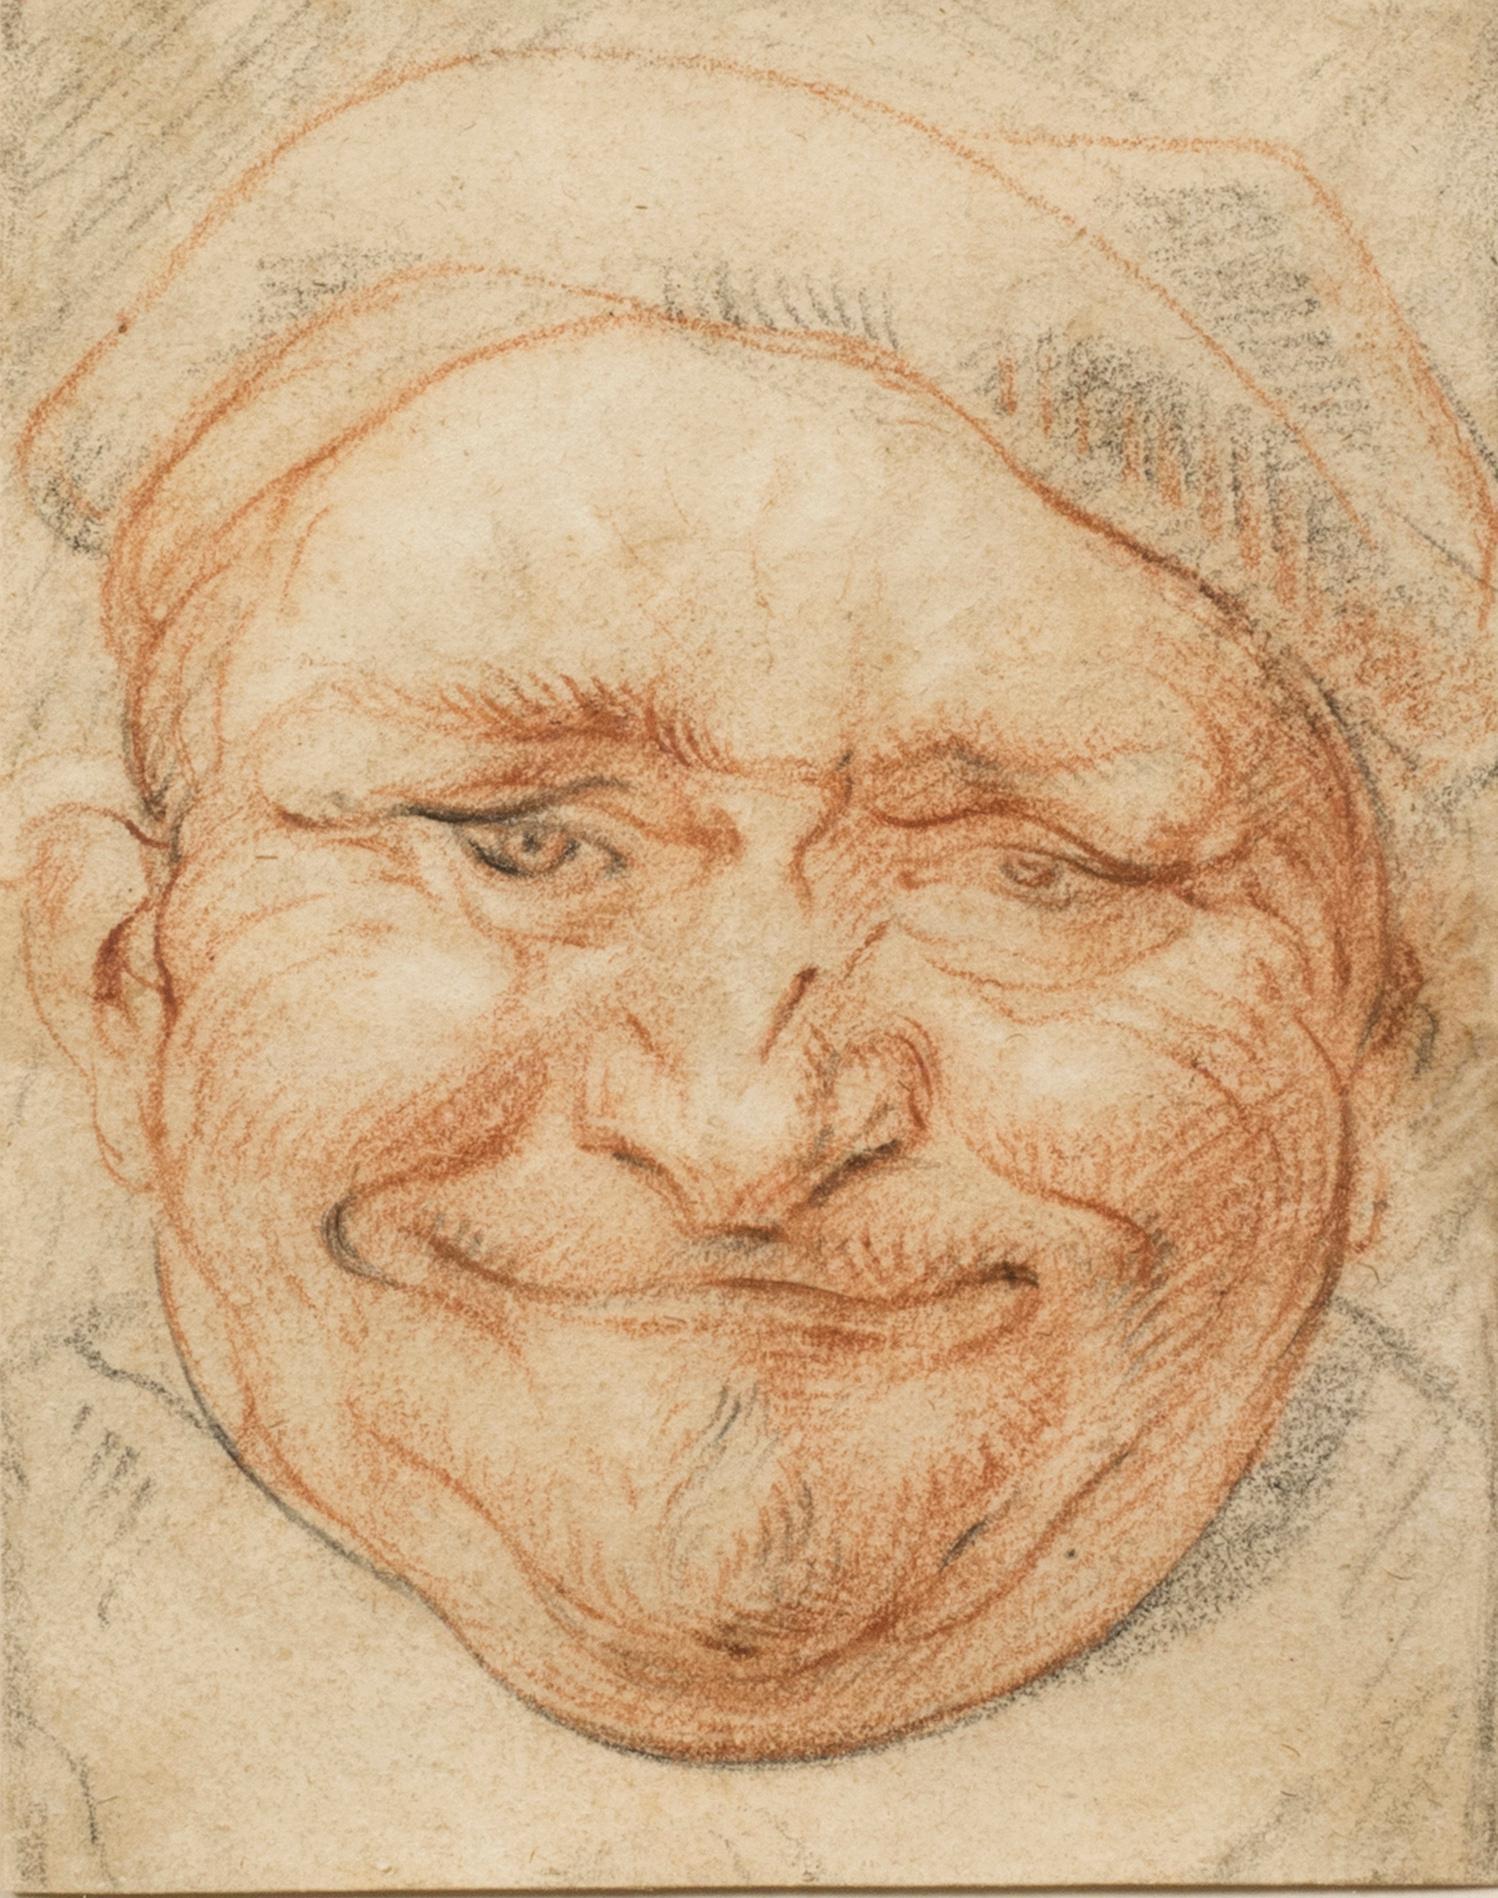 Head of a Cheerful Man Wearing a Cap